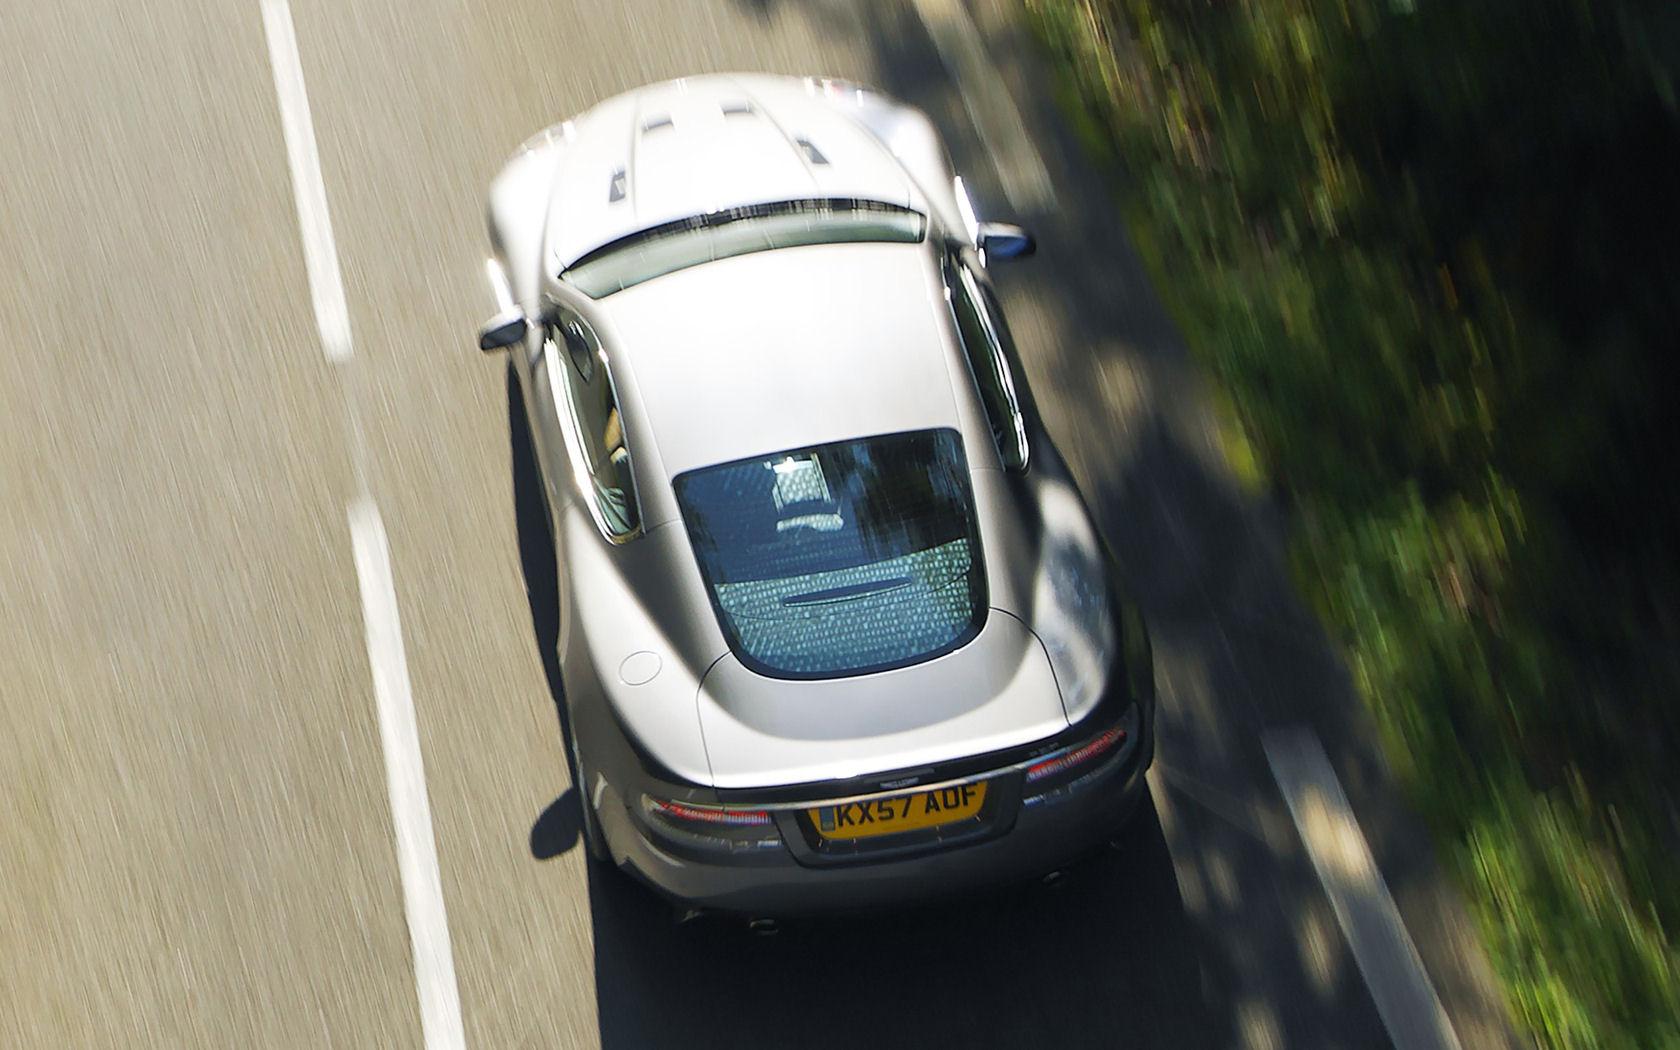 Aston Martin DBS Wallpaper Widescreen